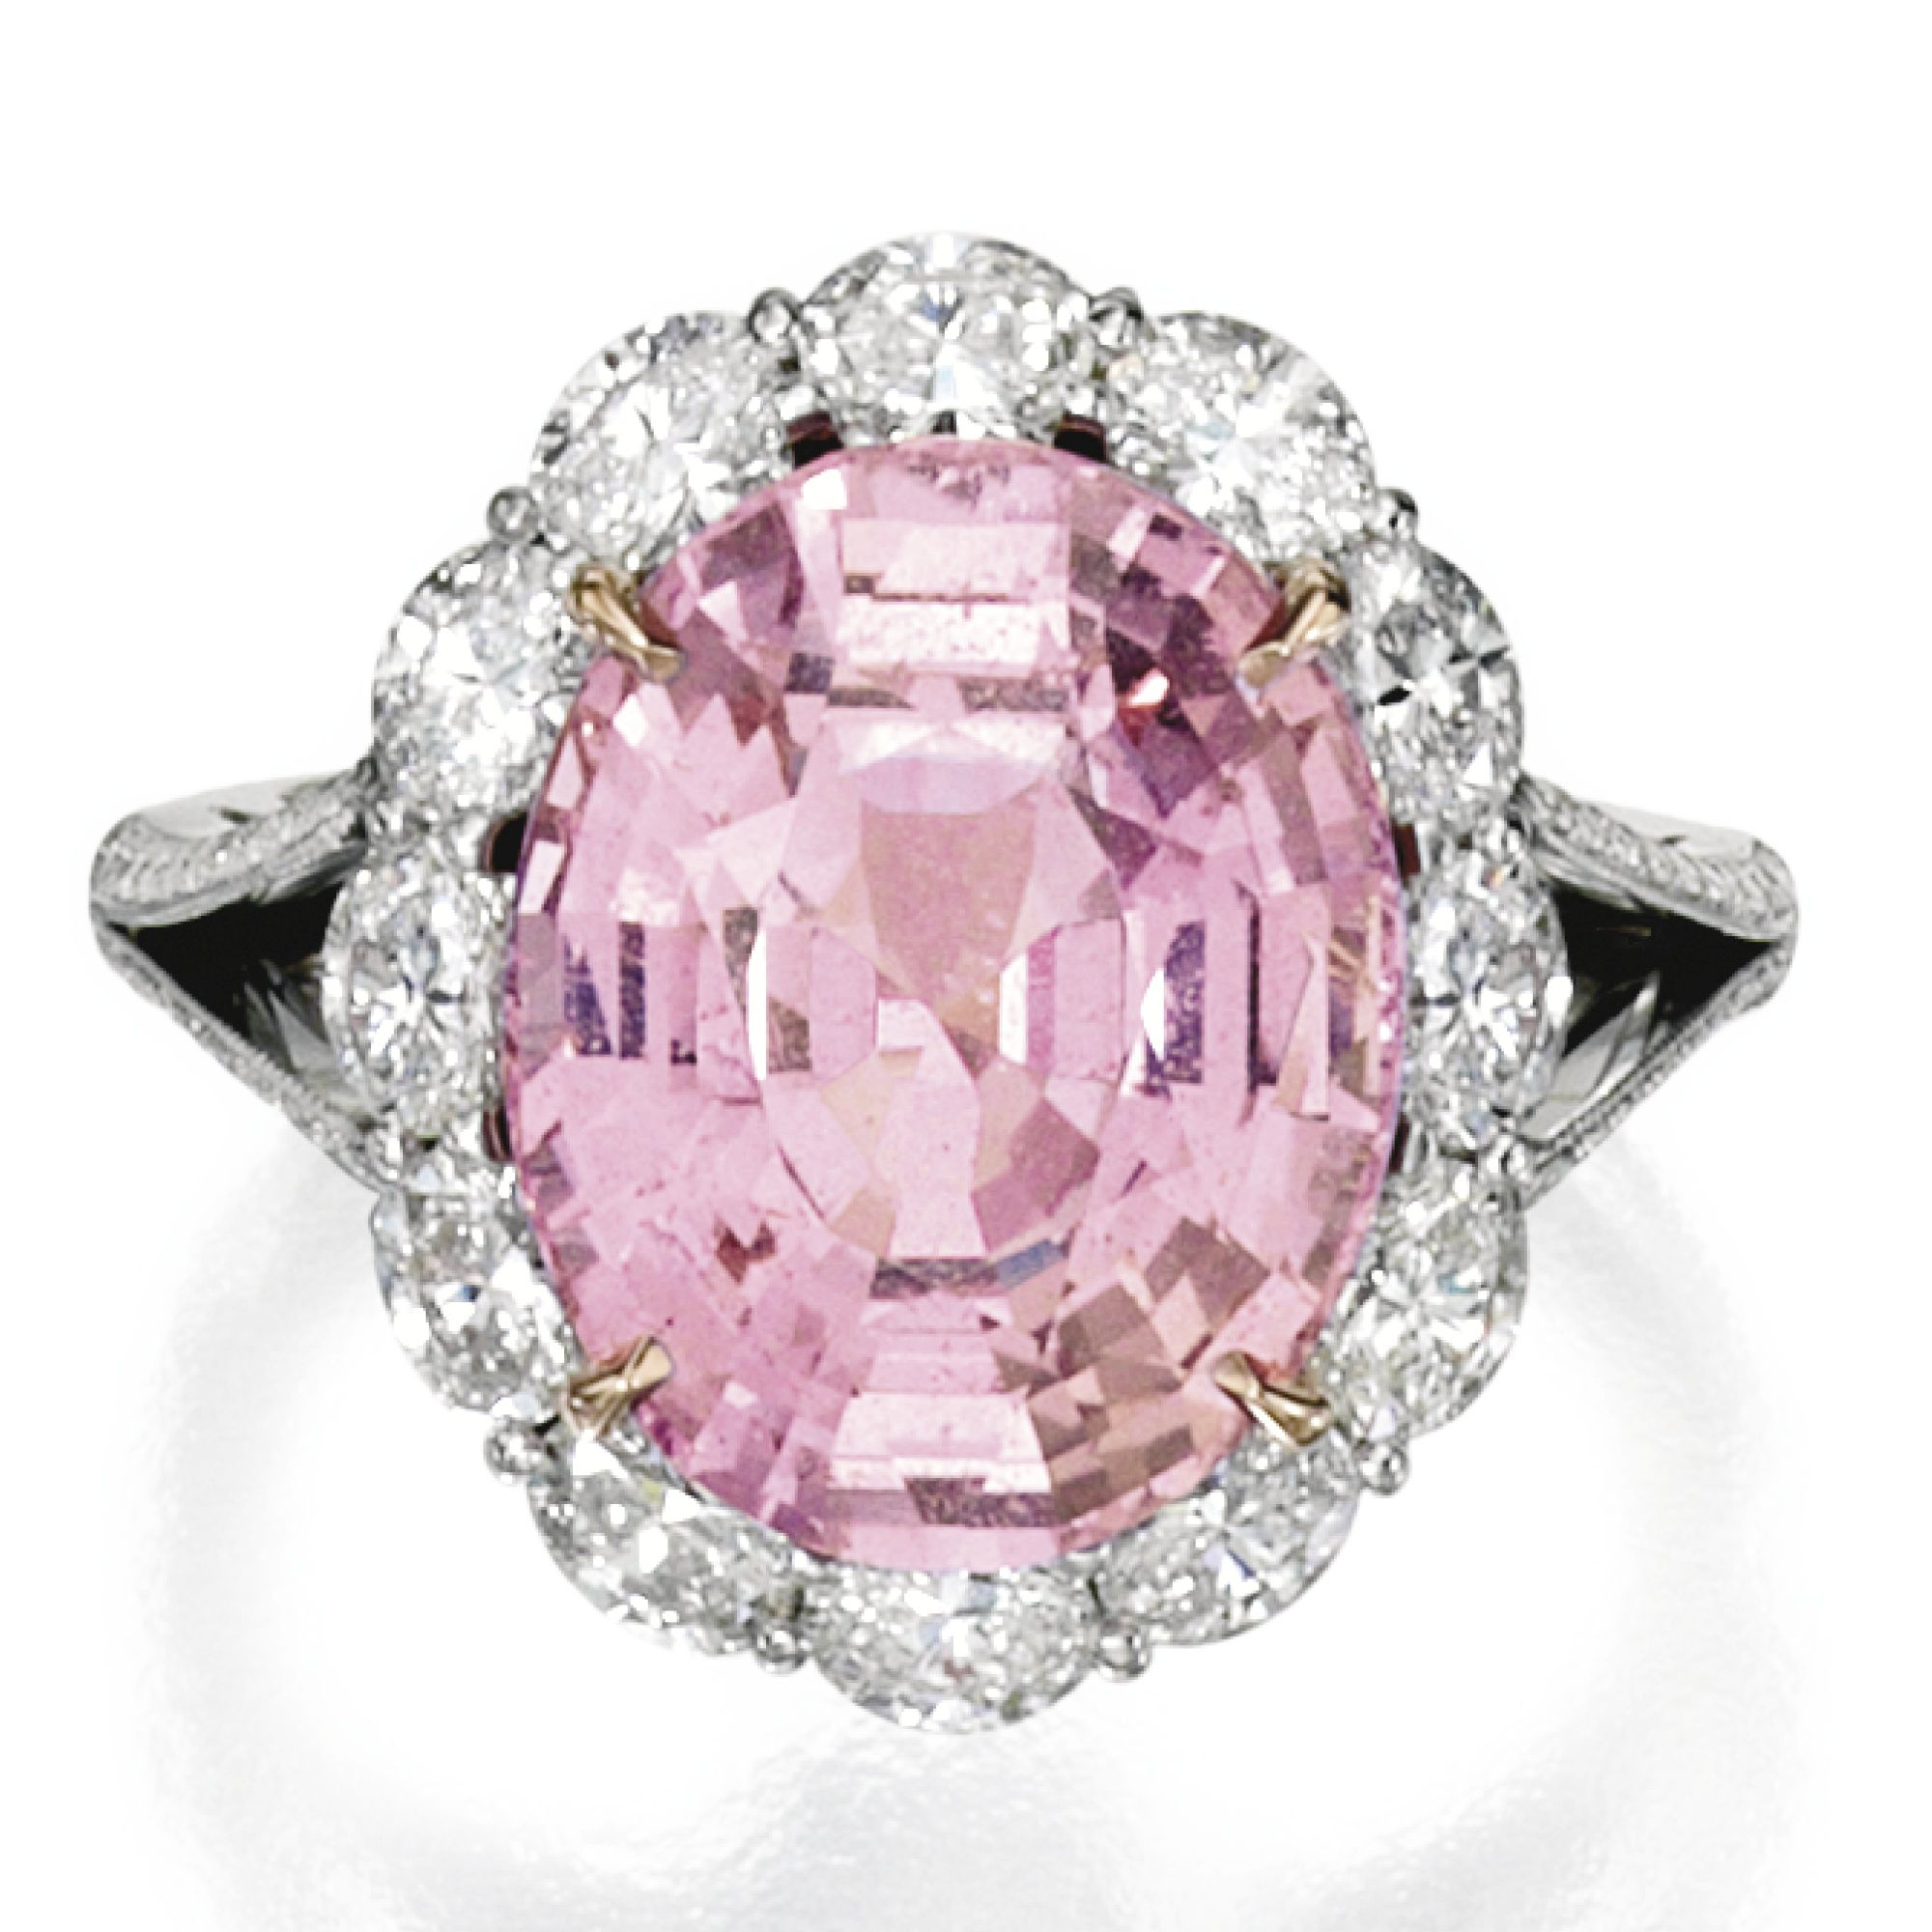 Platinum karat rose gold padparadscha sapphire and diamond ring